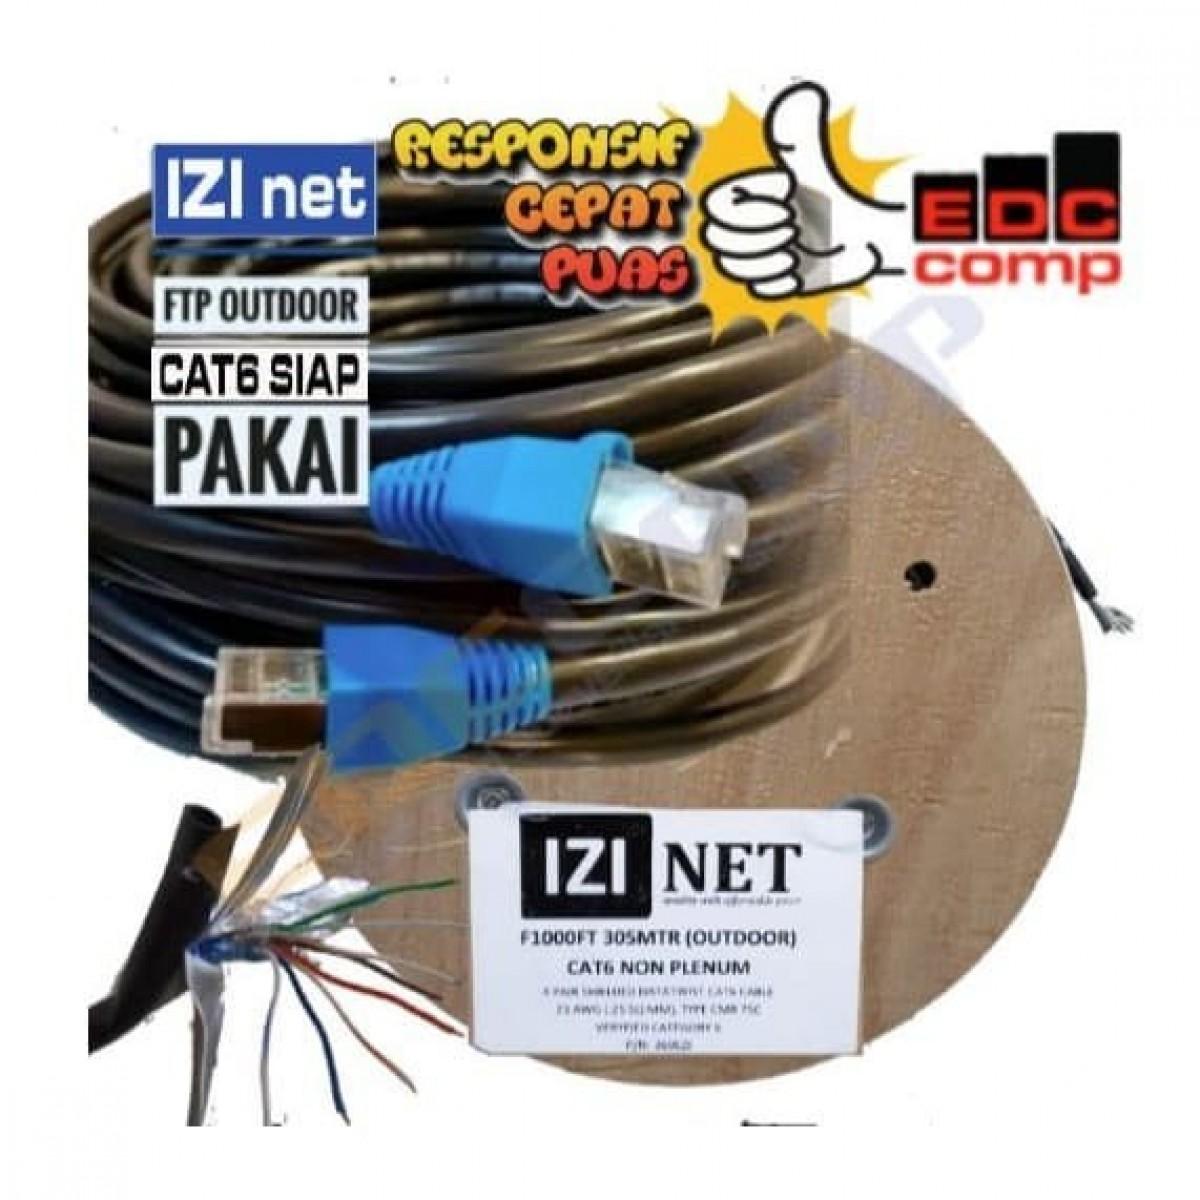 Cable STP/FTP Cat 6 Outdoor Cable 70 Meter IZI net Original - EdcComp